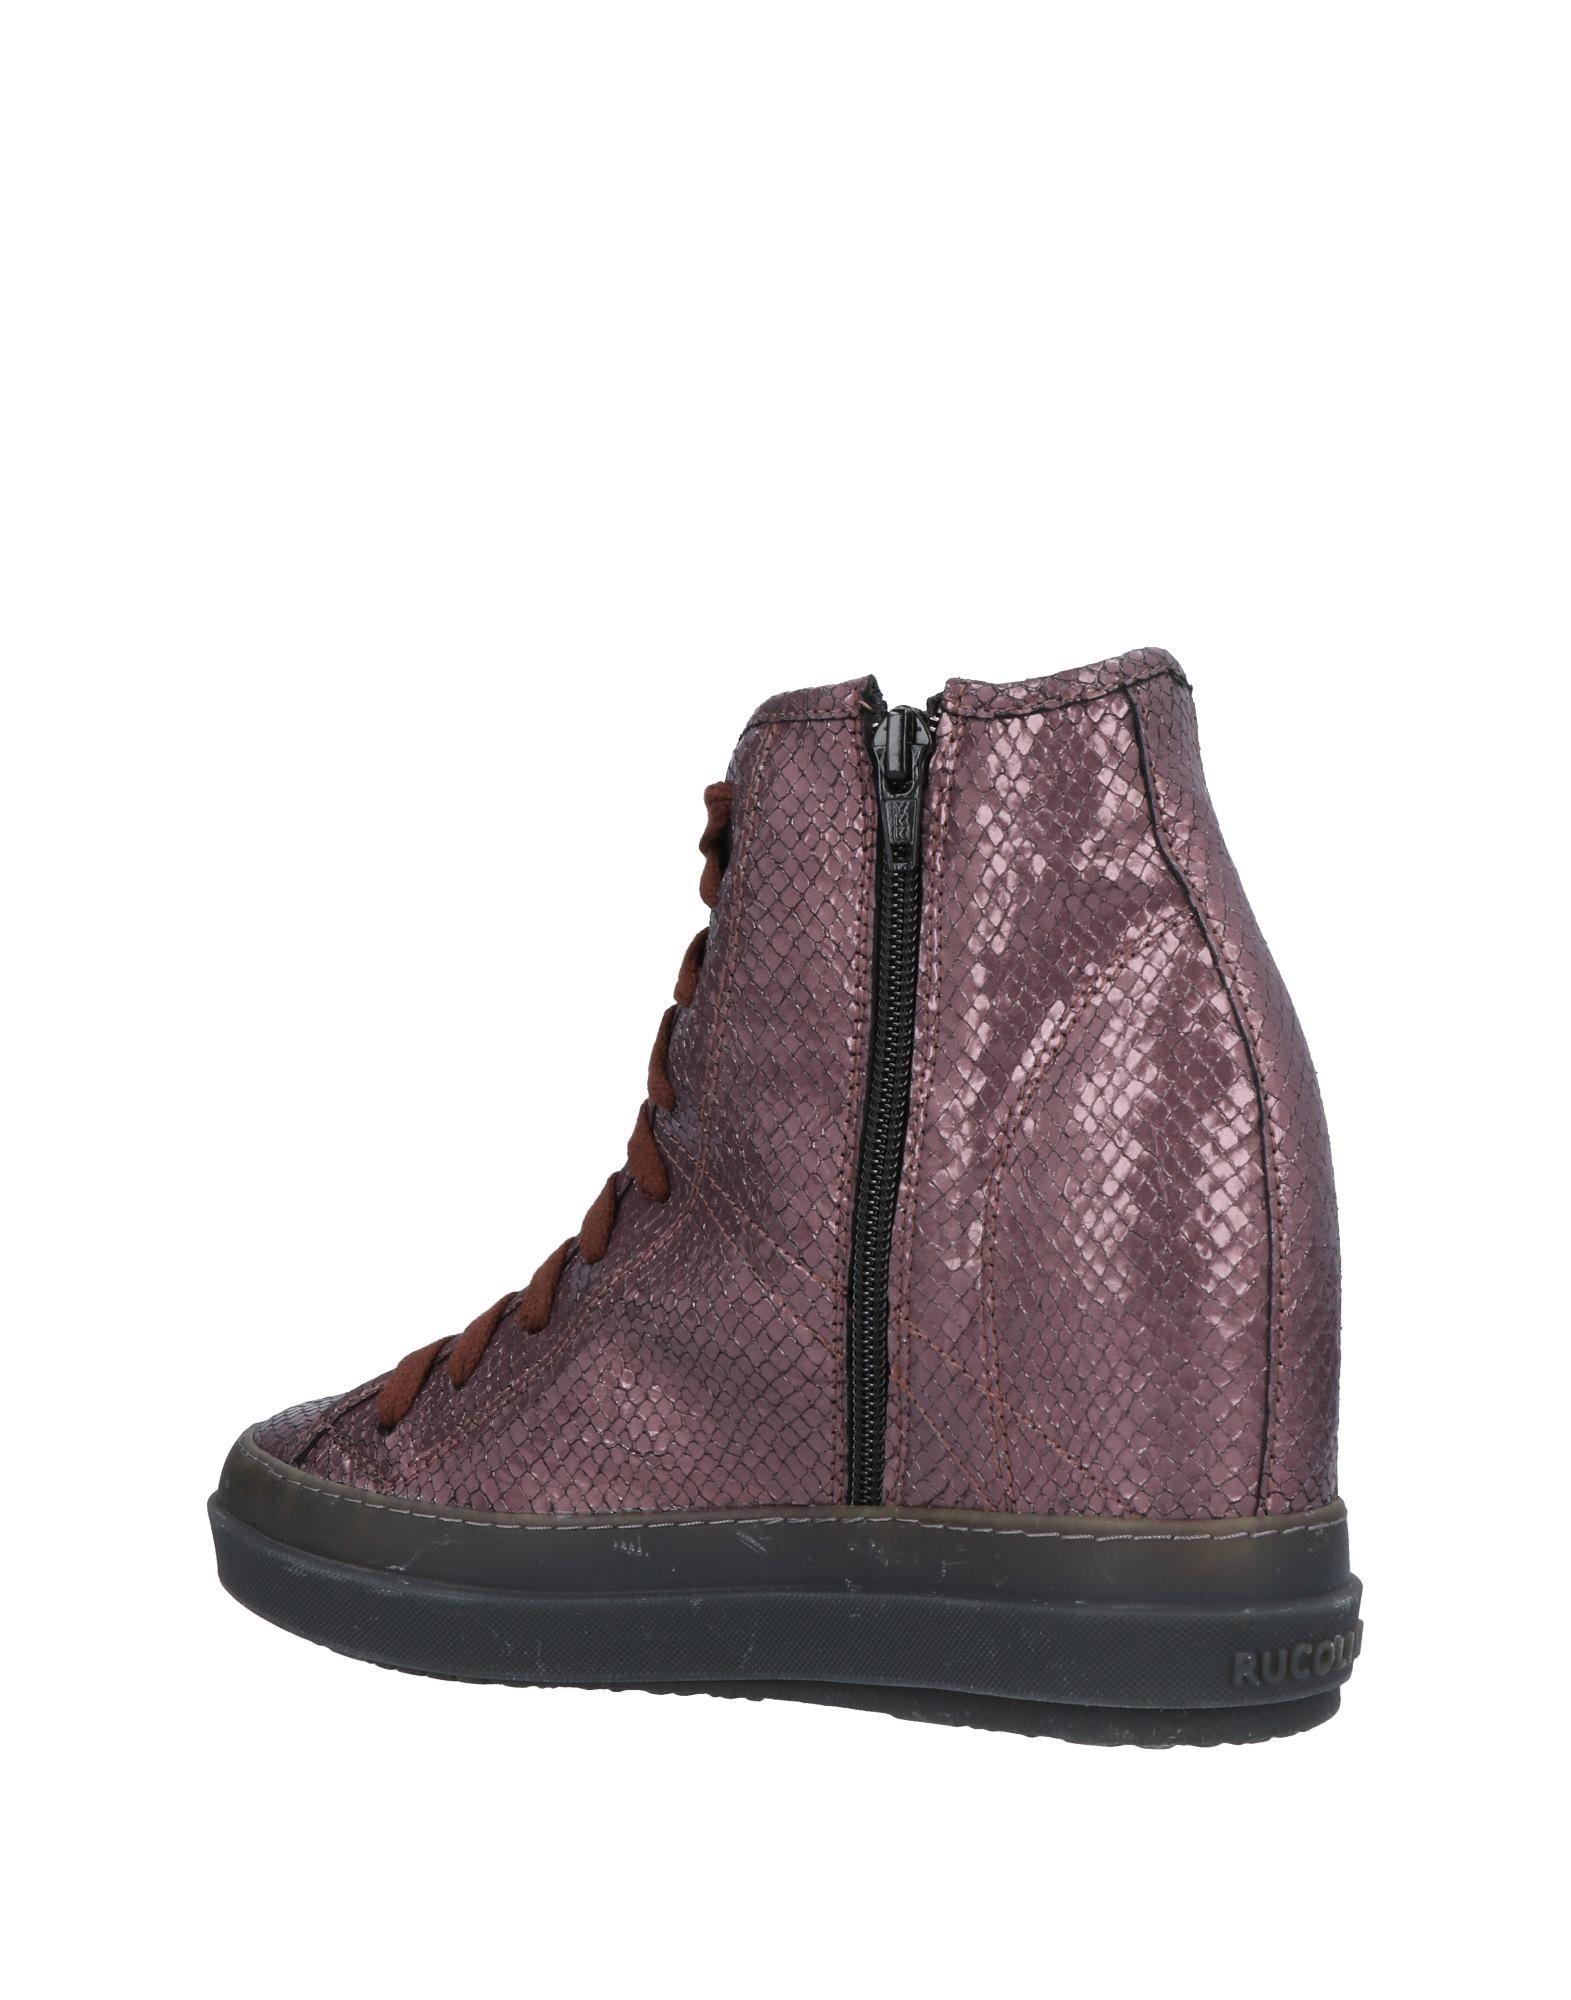 Ruco Sneakers Line Sneakers Ruco Damen Gutes Preis-Leistungs-Verhältnis, es lohnt sich a7a261